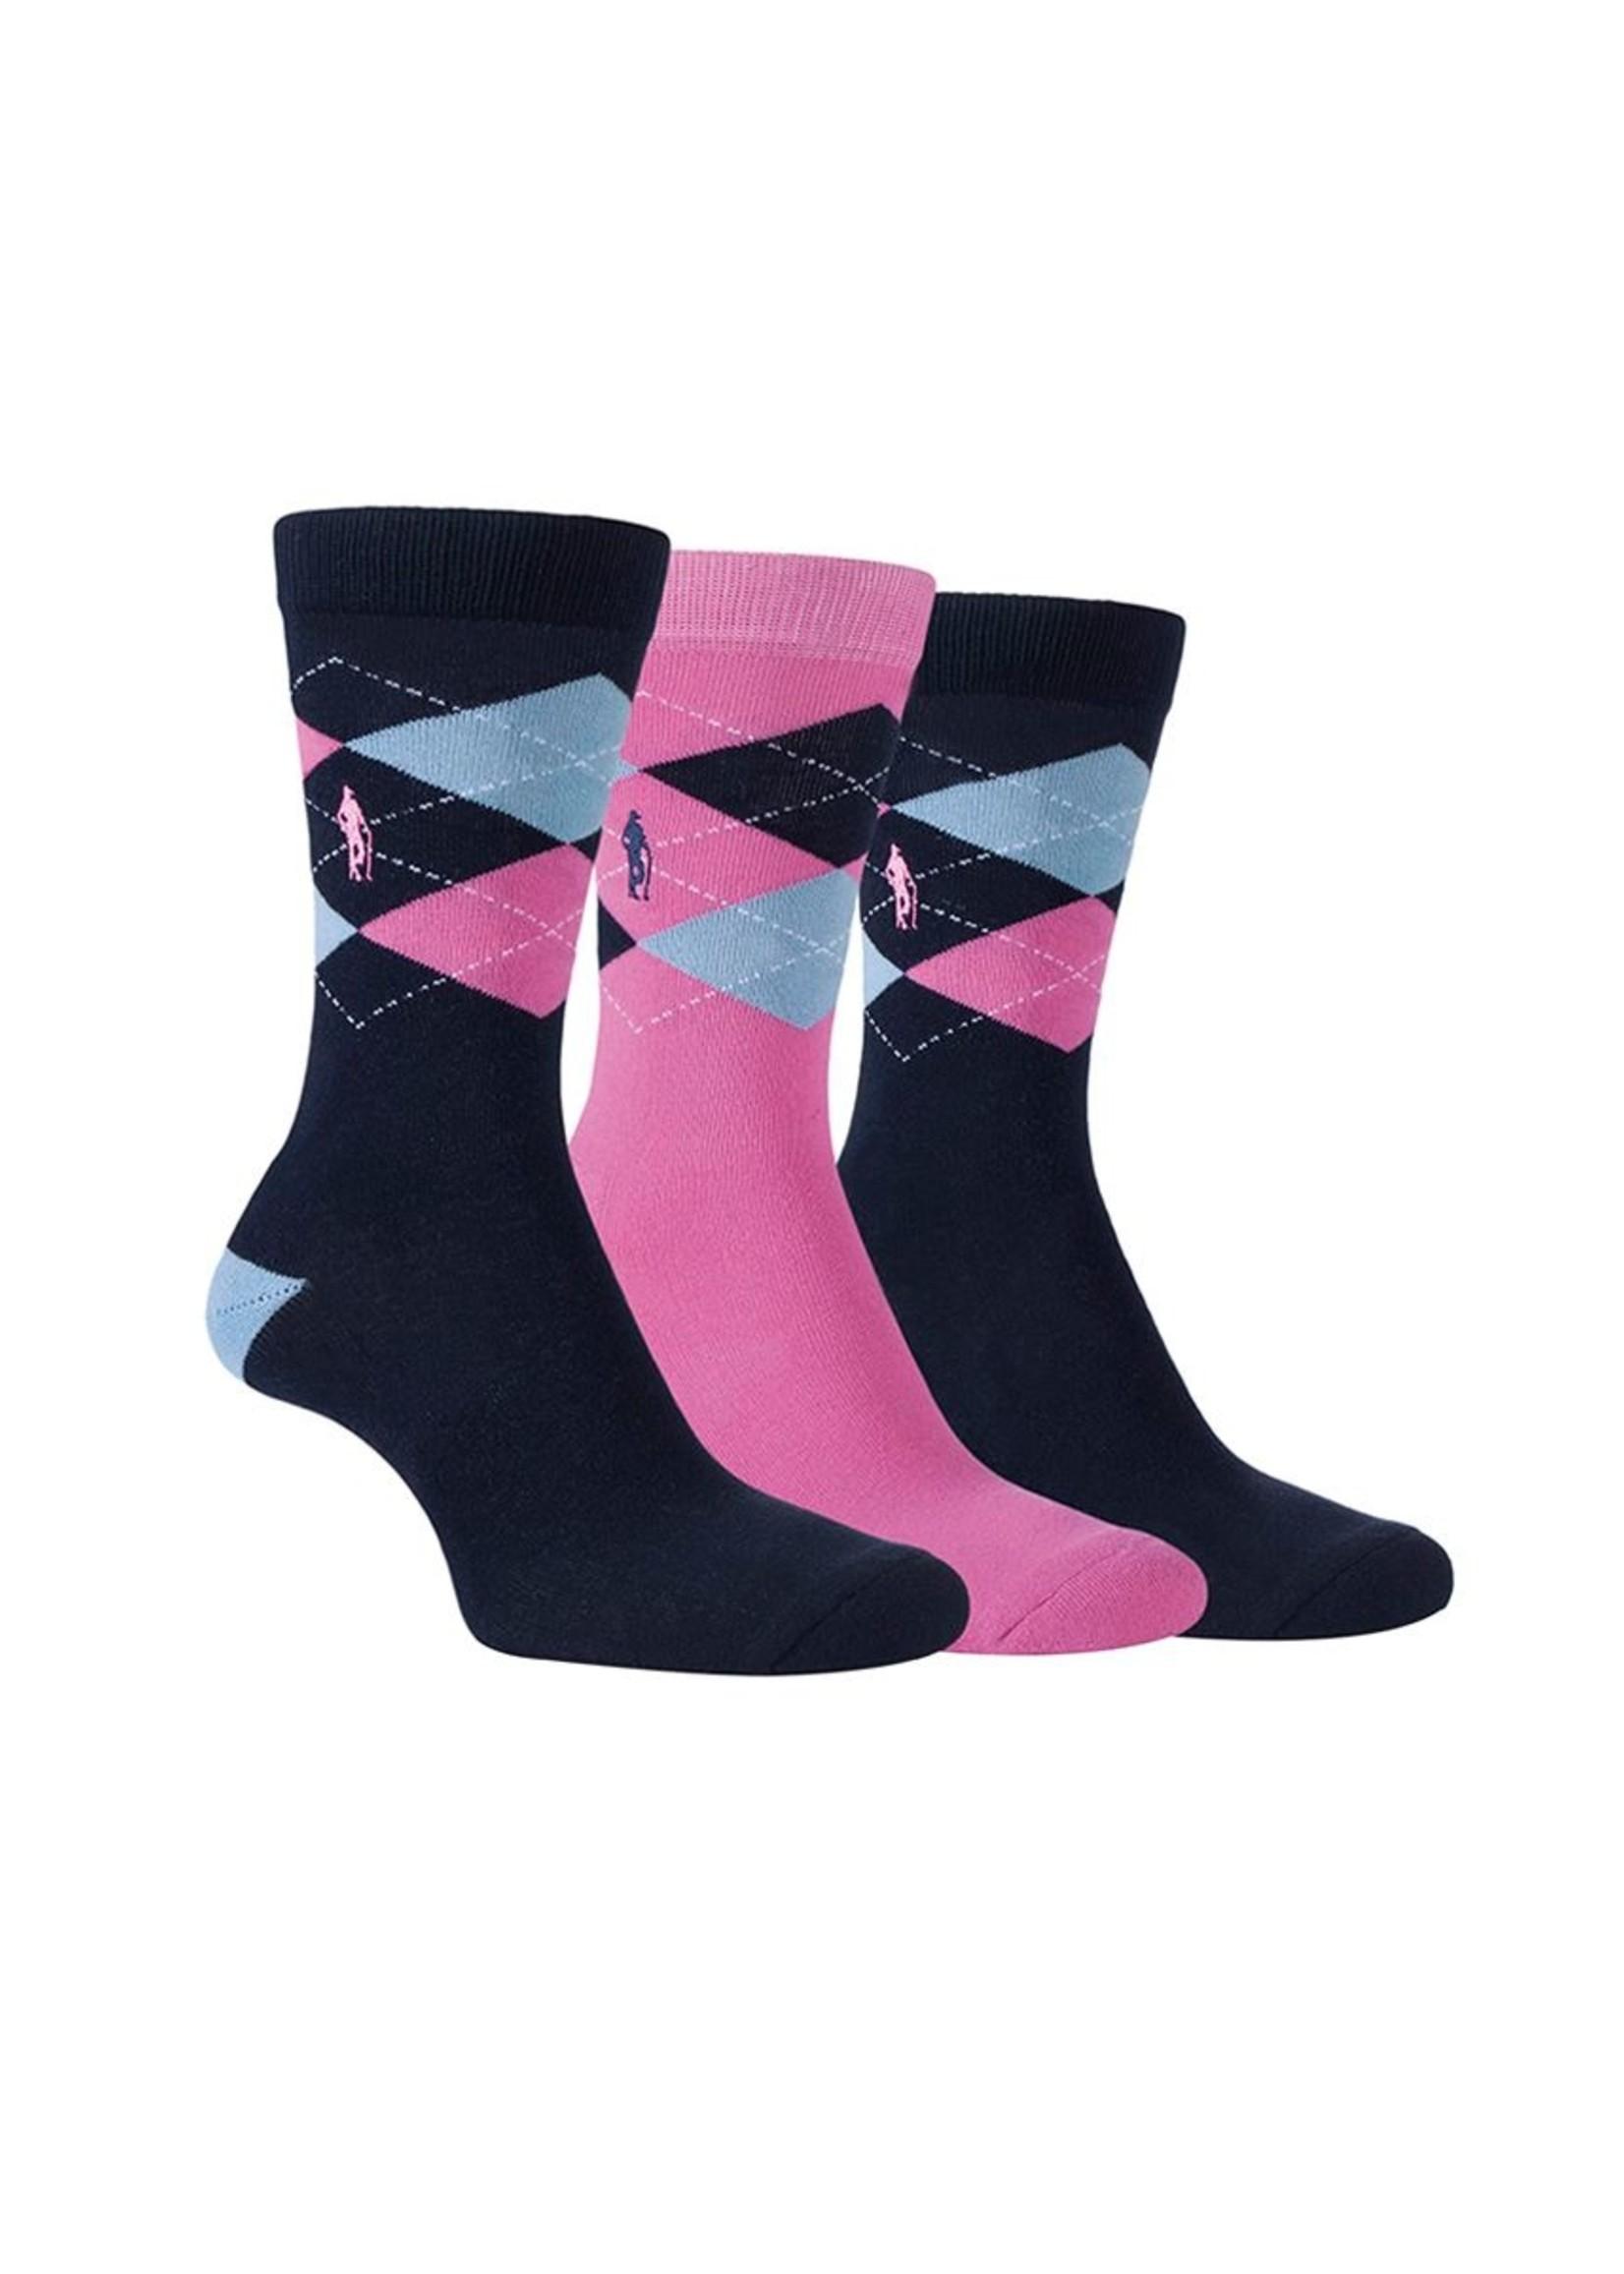 Glenmuir Glenmuir Alice Argyle Jacquard Cotton Socks Gift Box (2019)